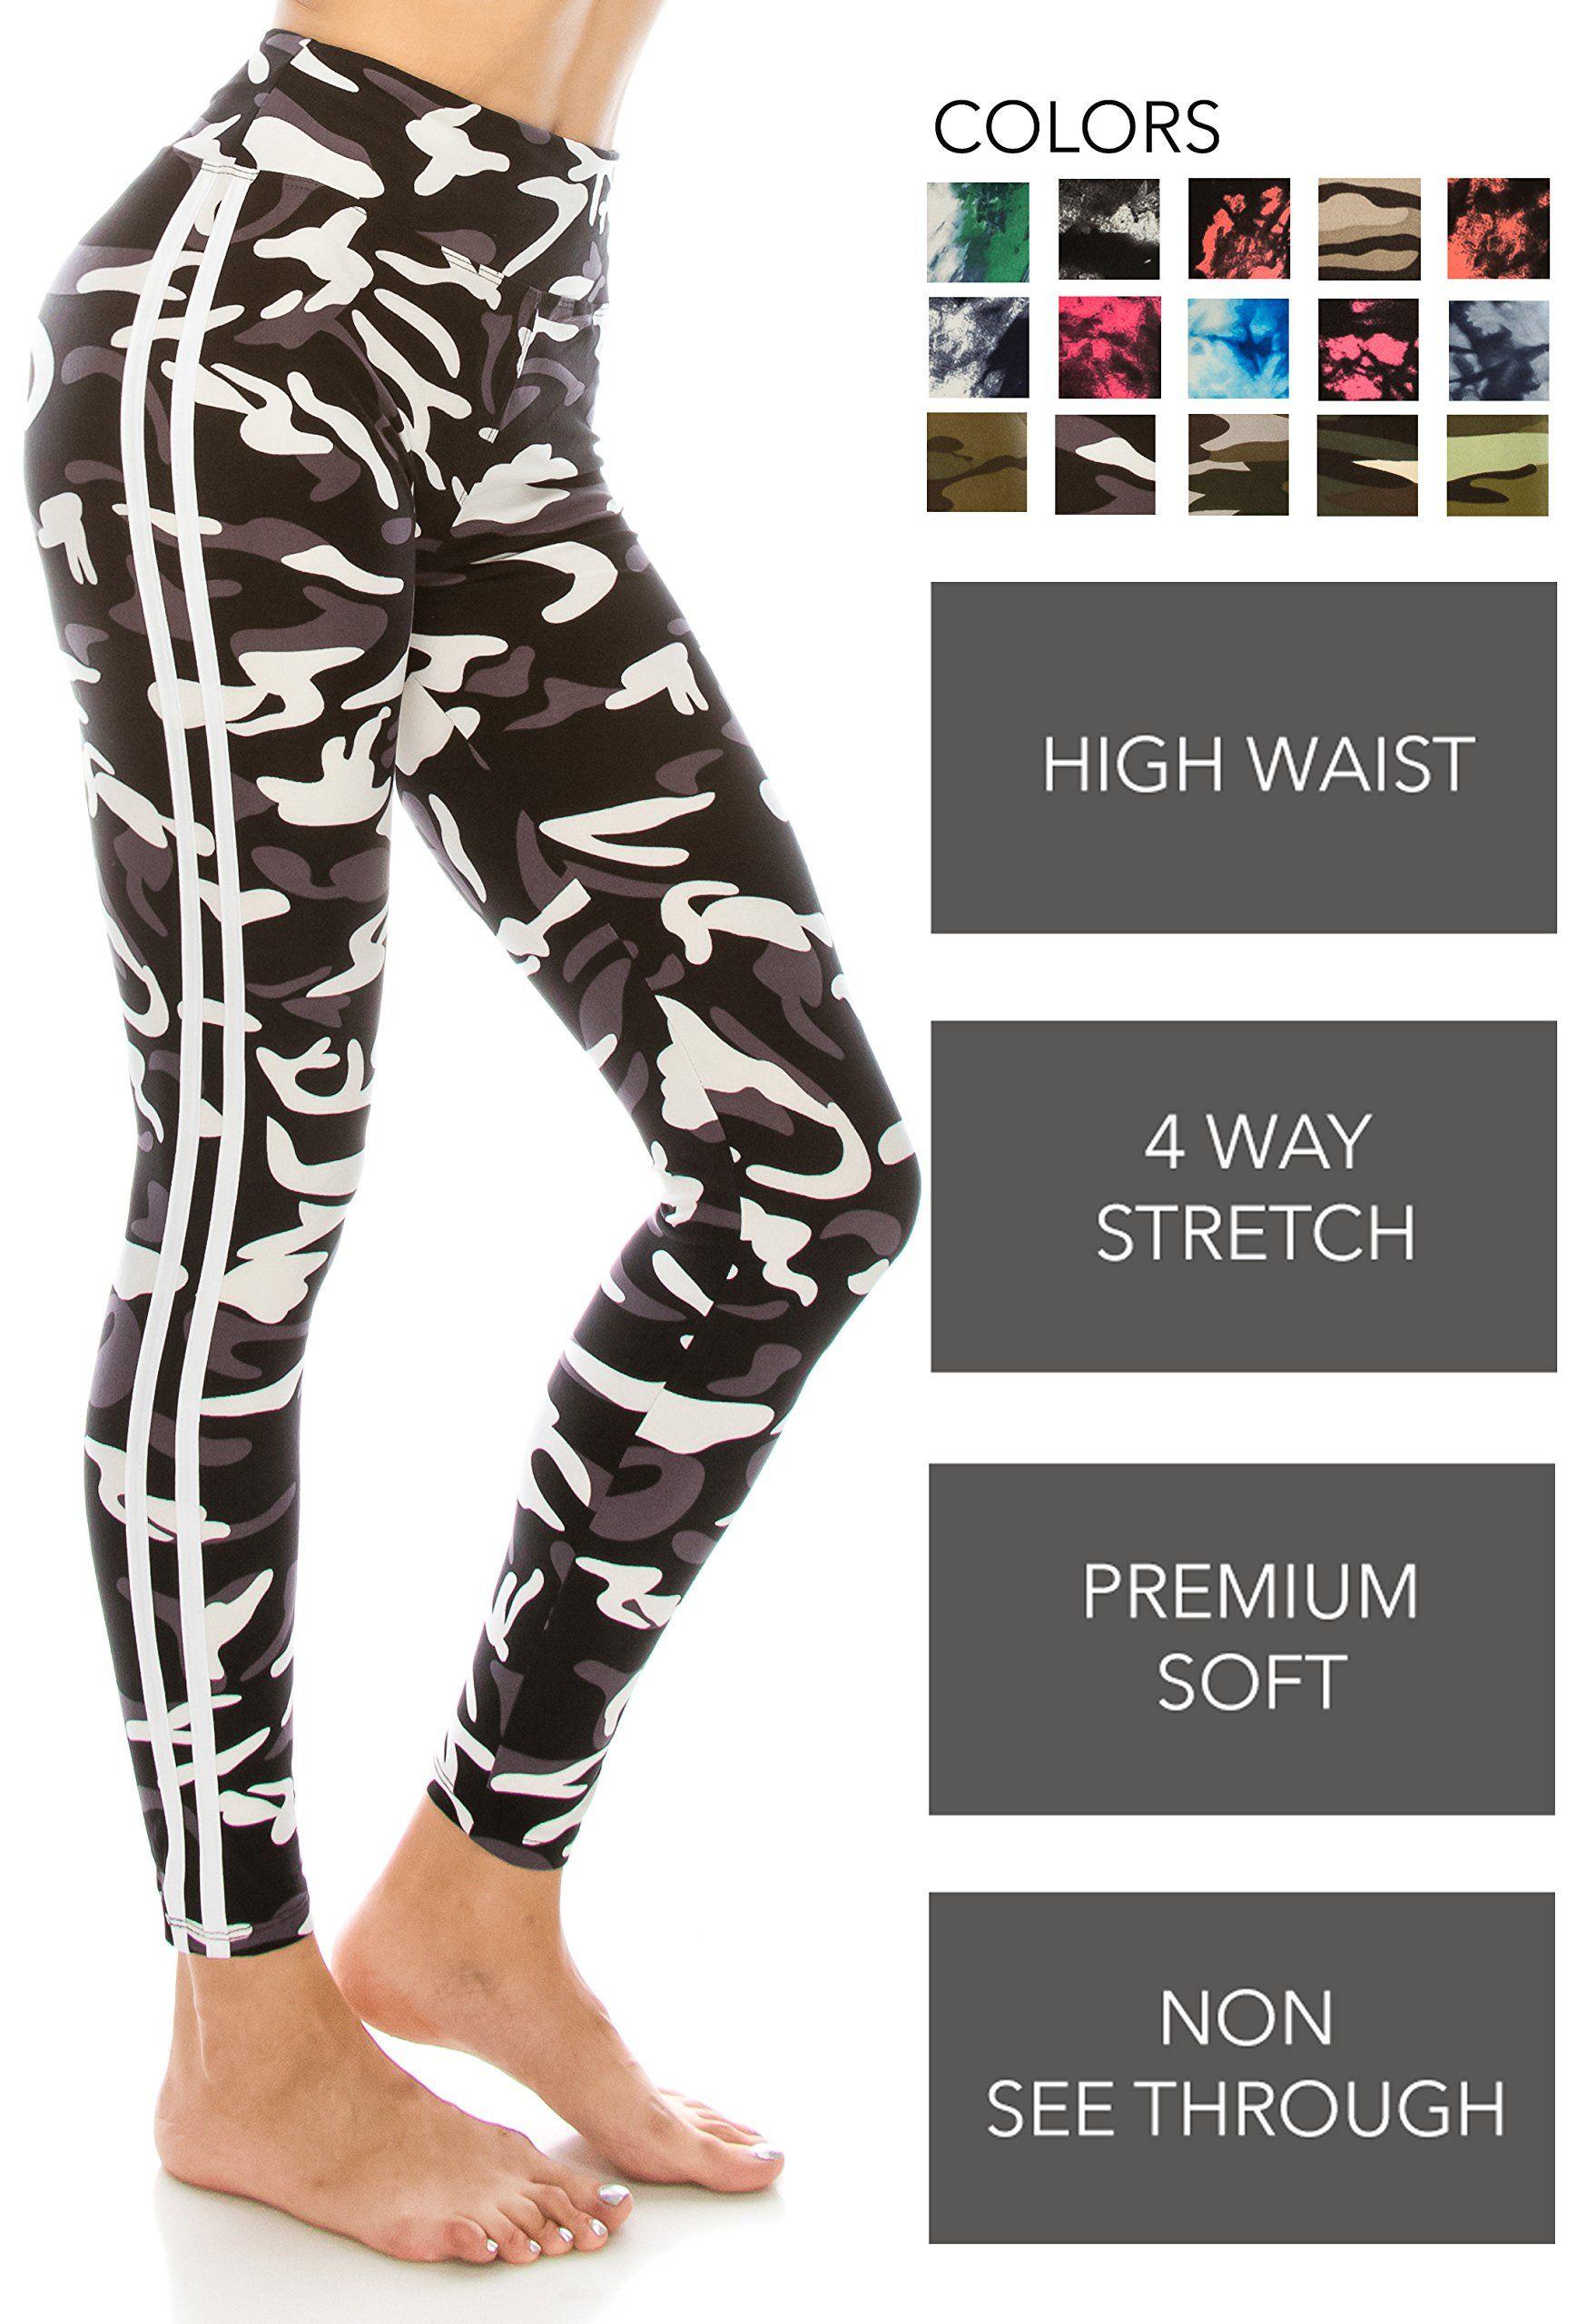 ffb02e9d32 ALWAYS Leggings Women Yoga Pants Camo Military Army Print Pattern ...